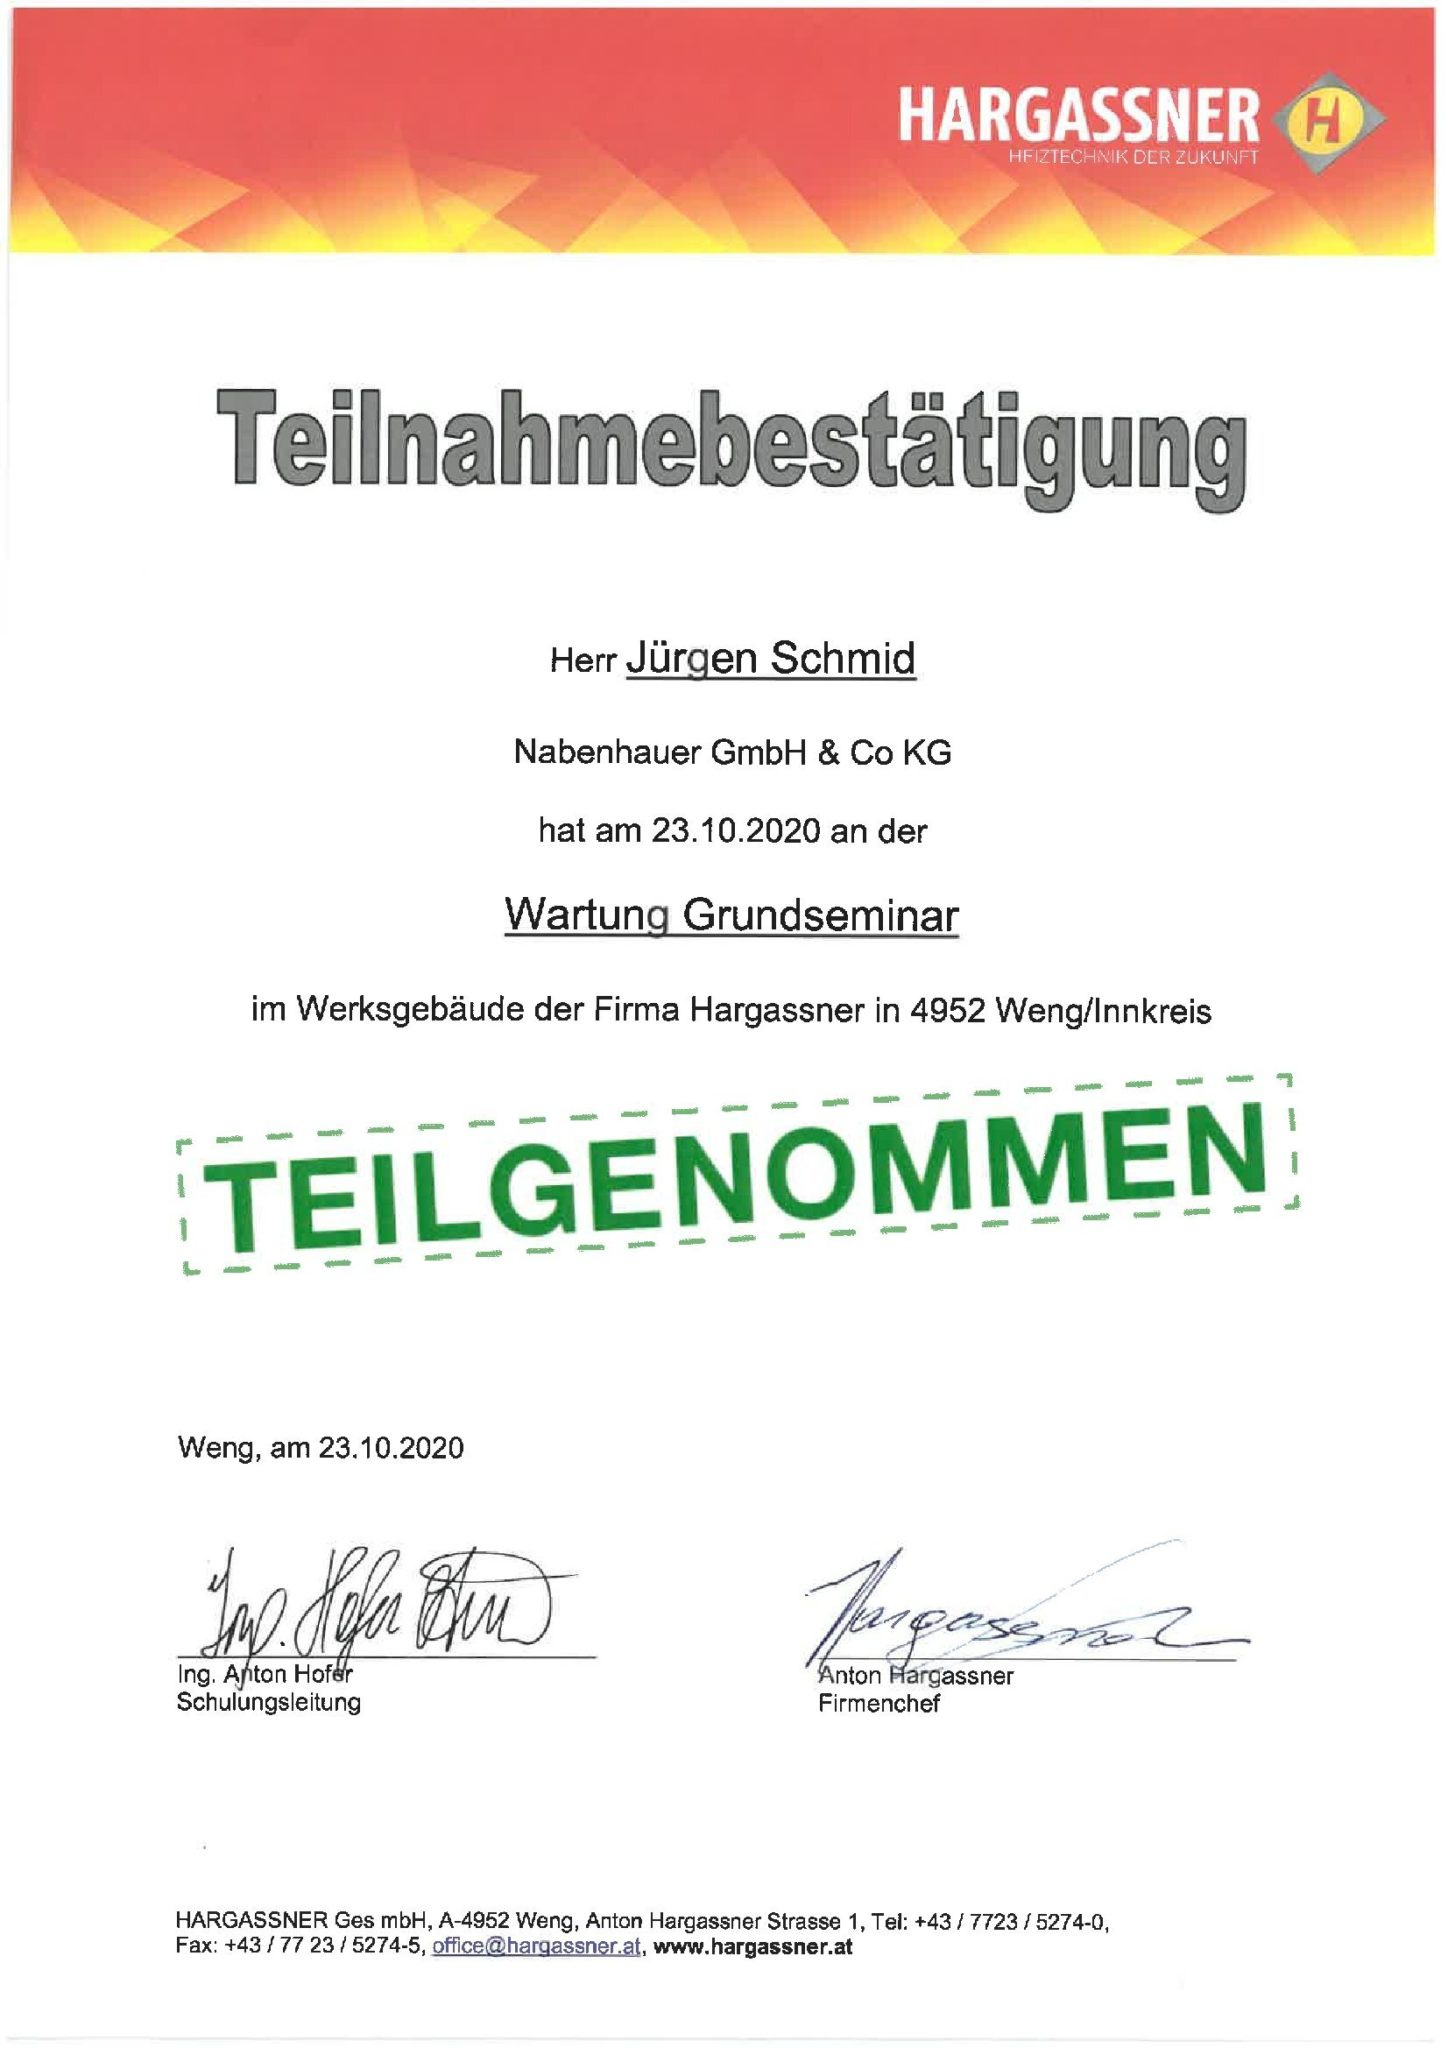 Schmid Jürgen Hargassner Wartung